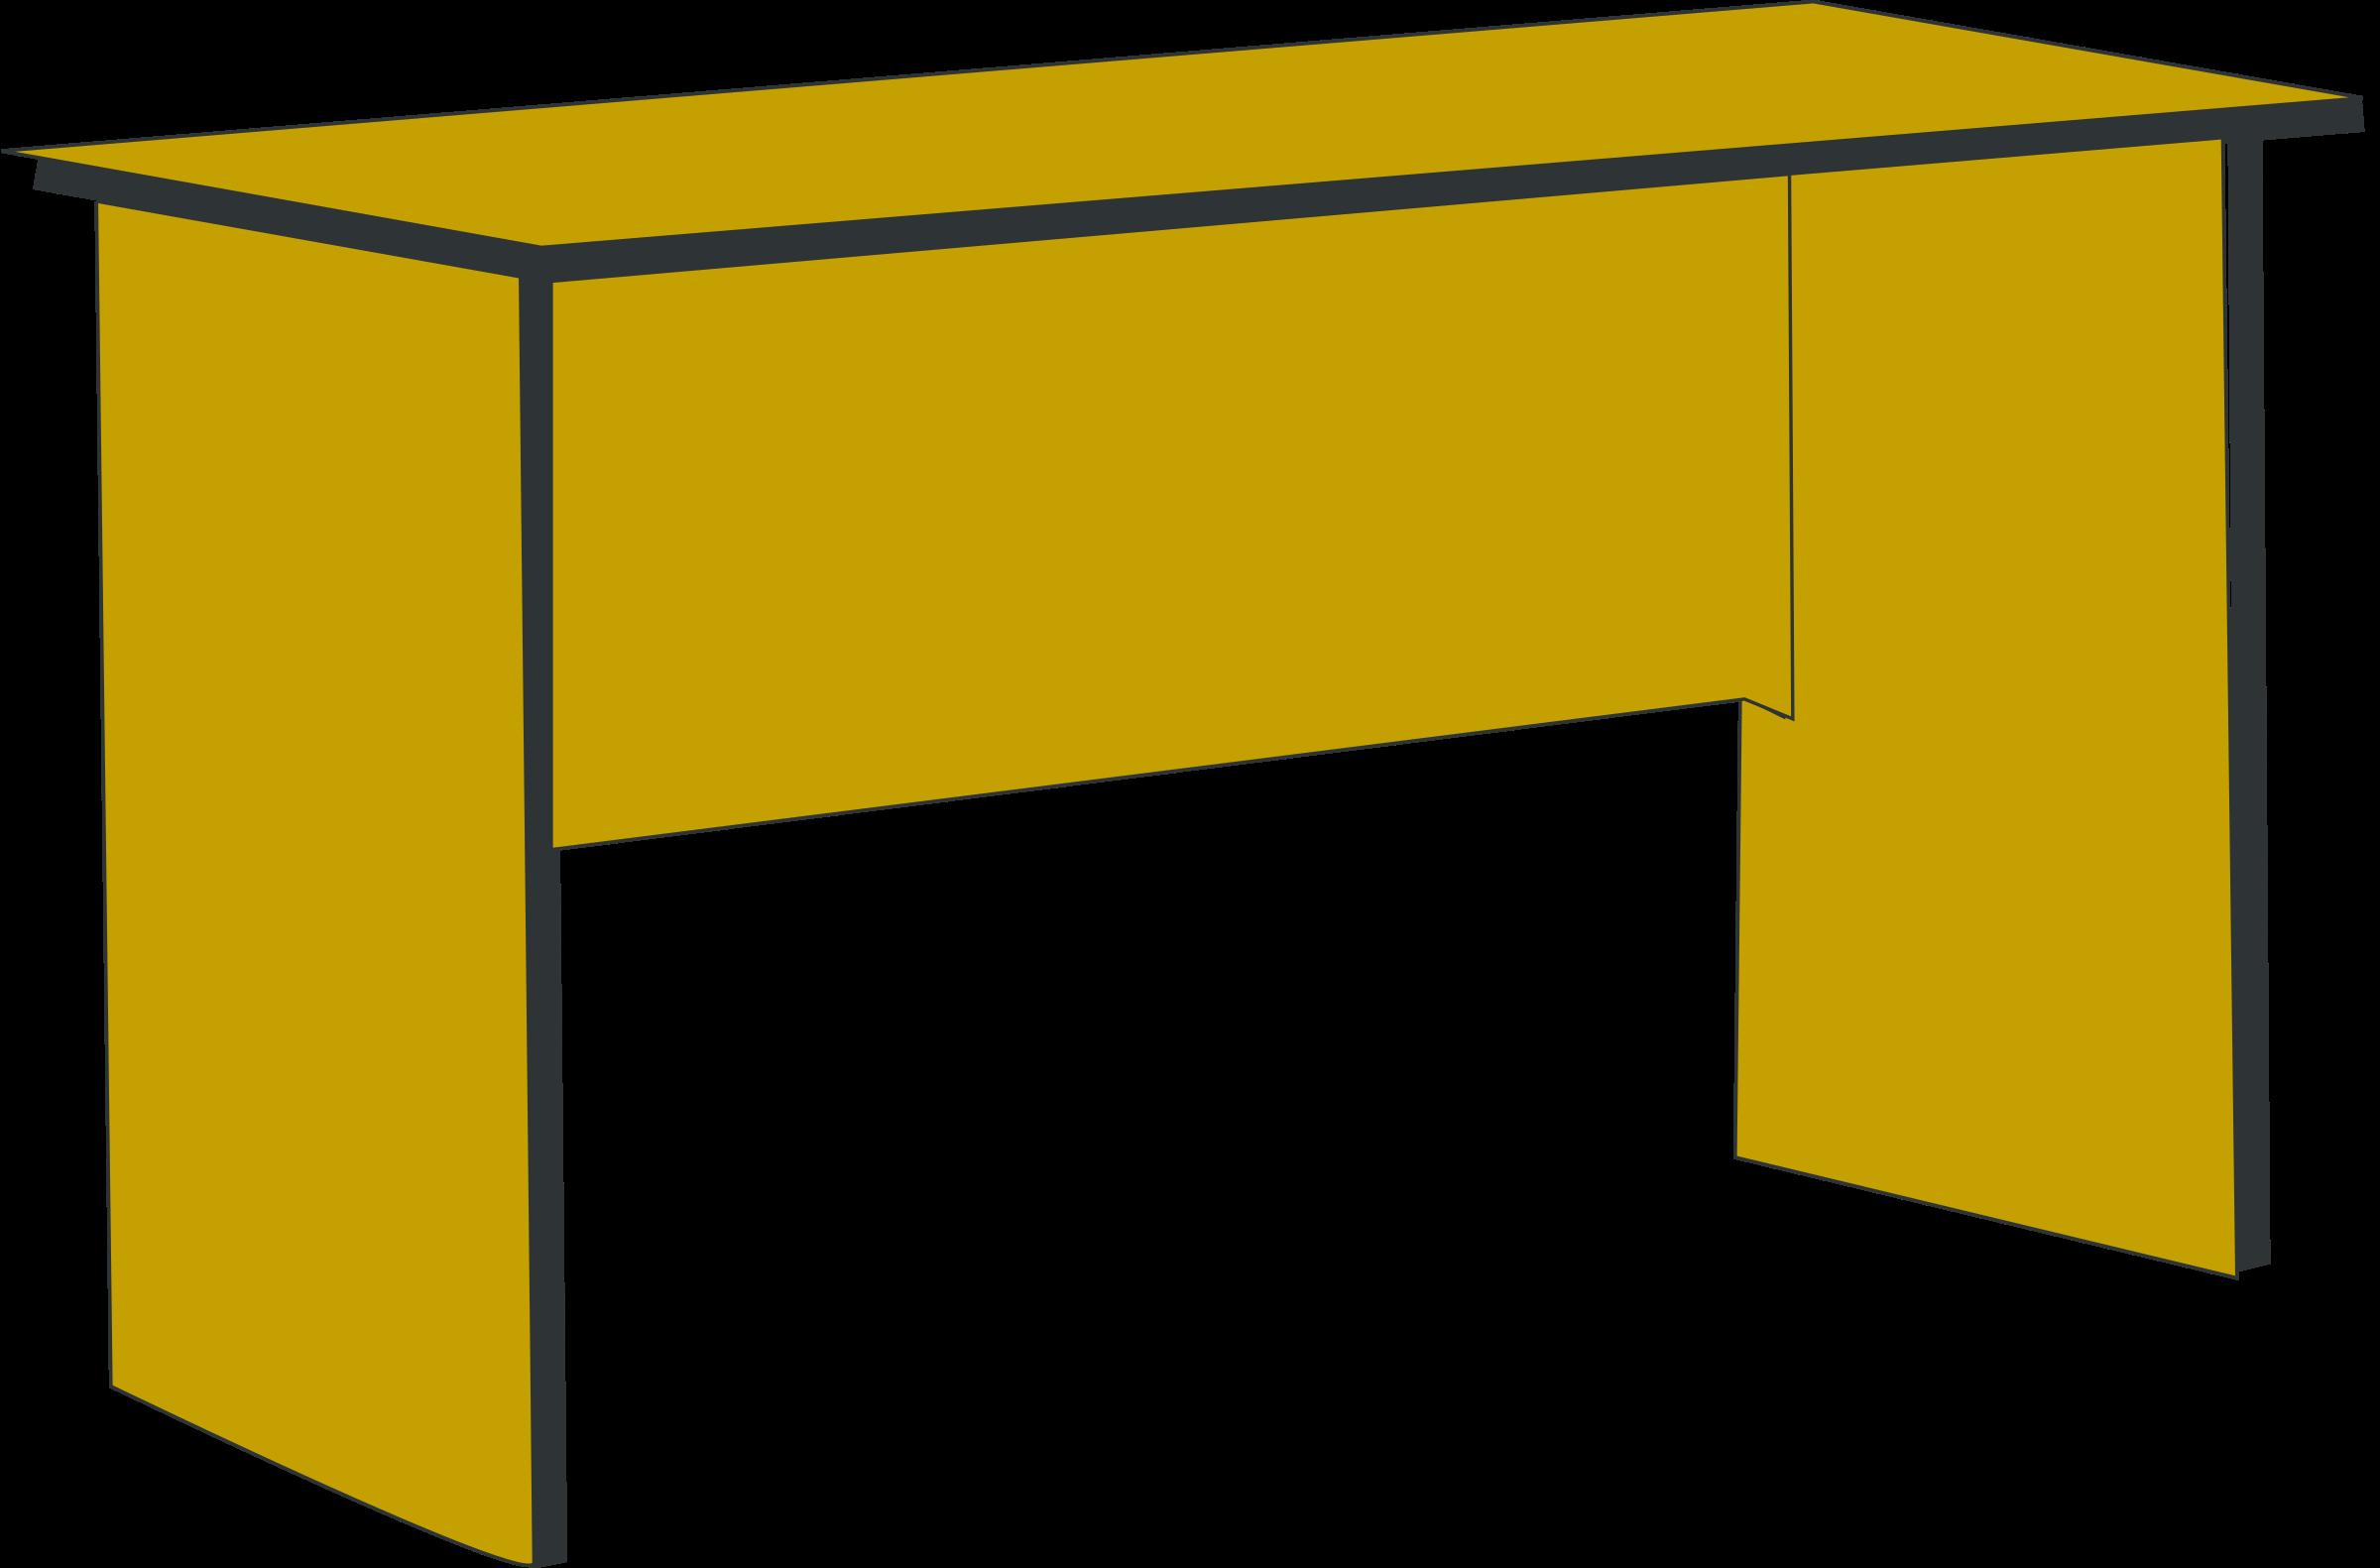 Desk clipart meja Desk Nuvola 1 Clipart Desk